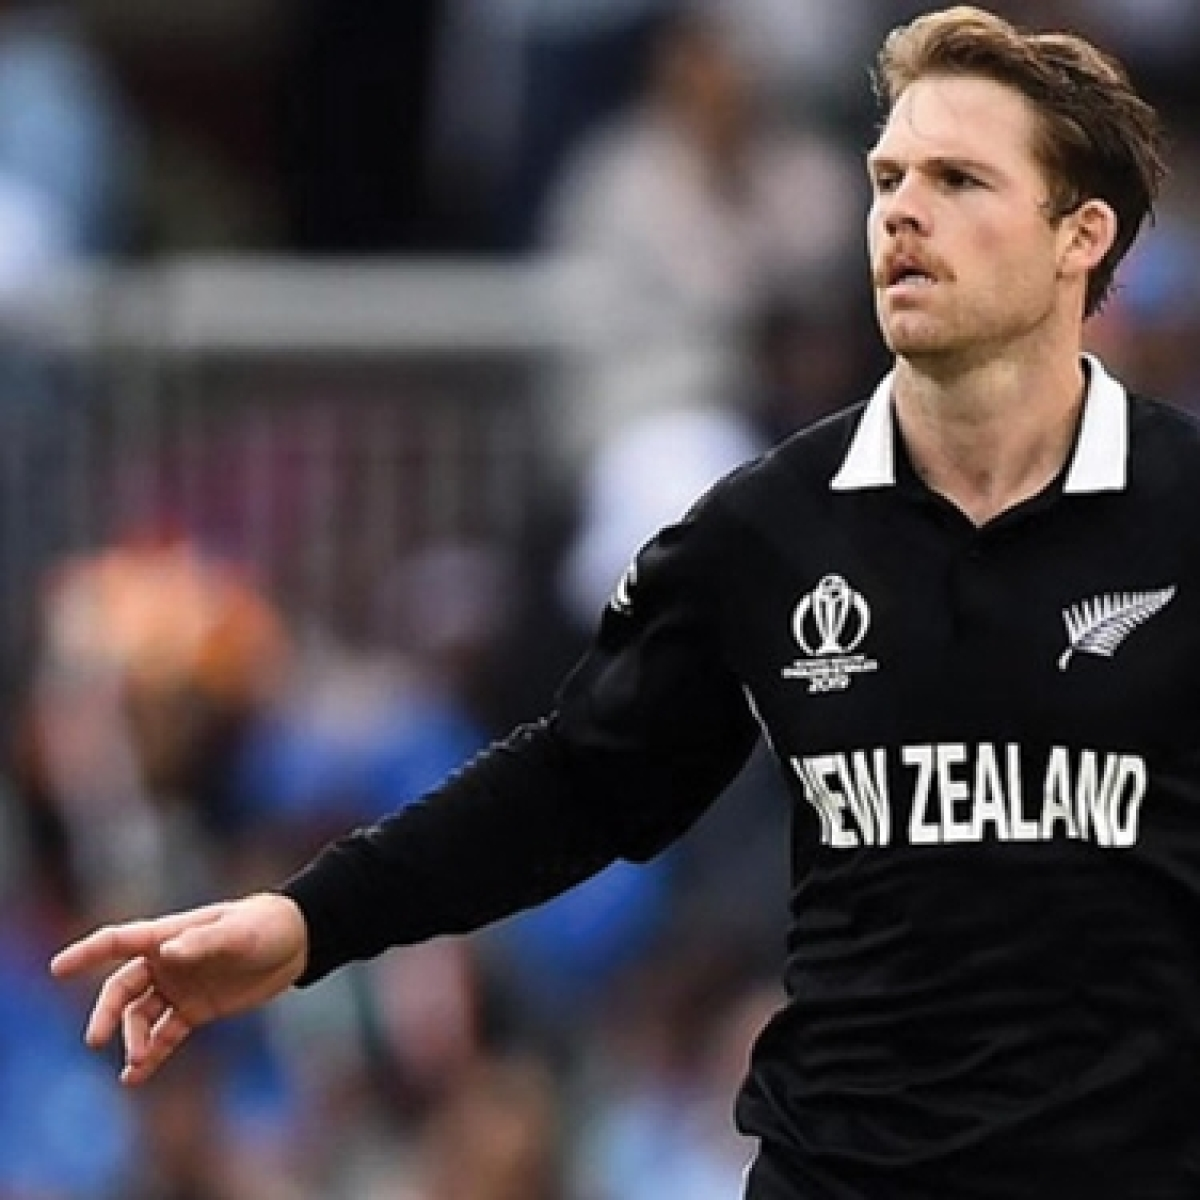 Latest coronavirus update: New Zealand bowler Lockie Ferguson in isolation over virus fears